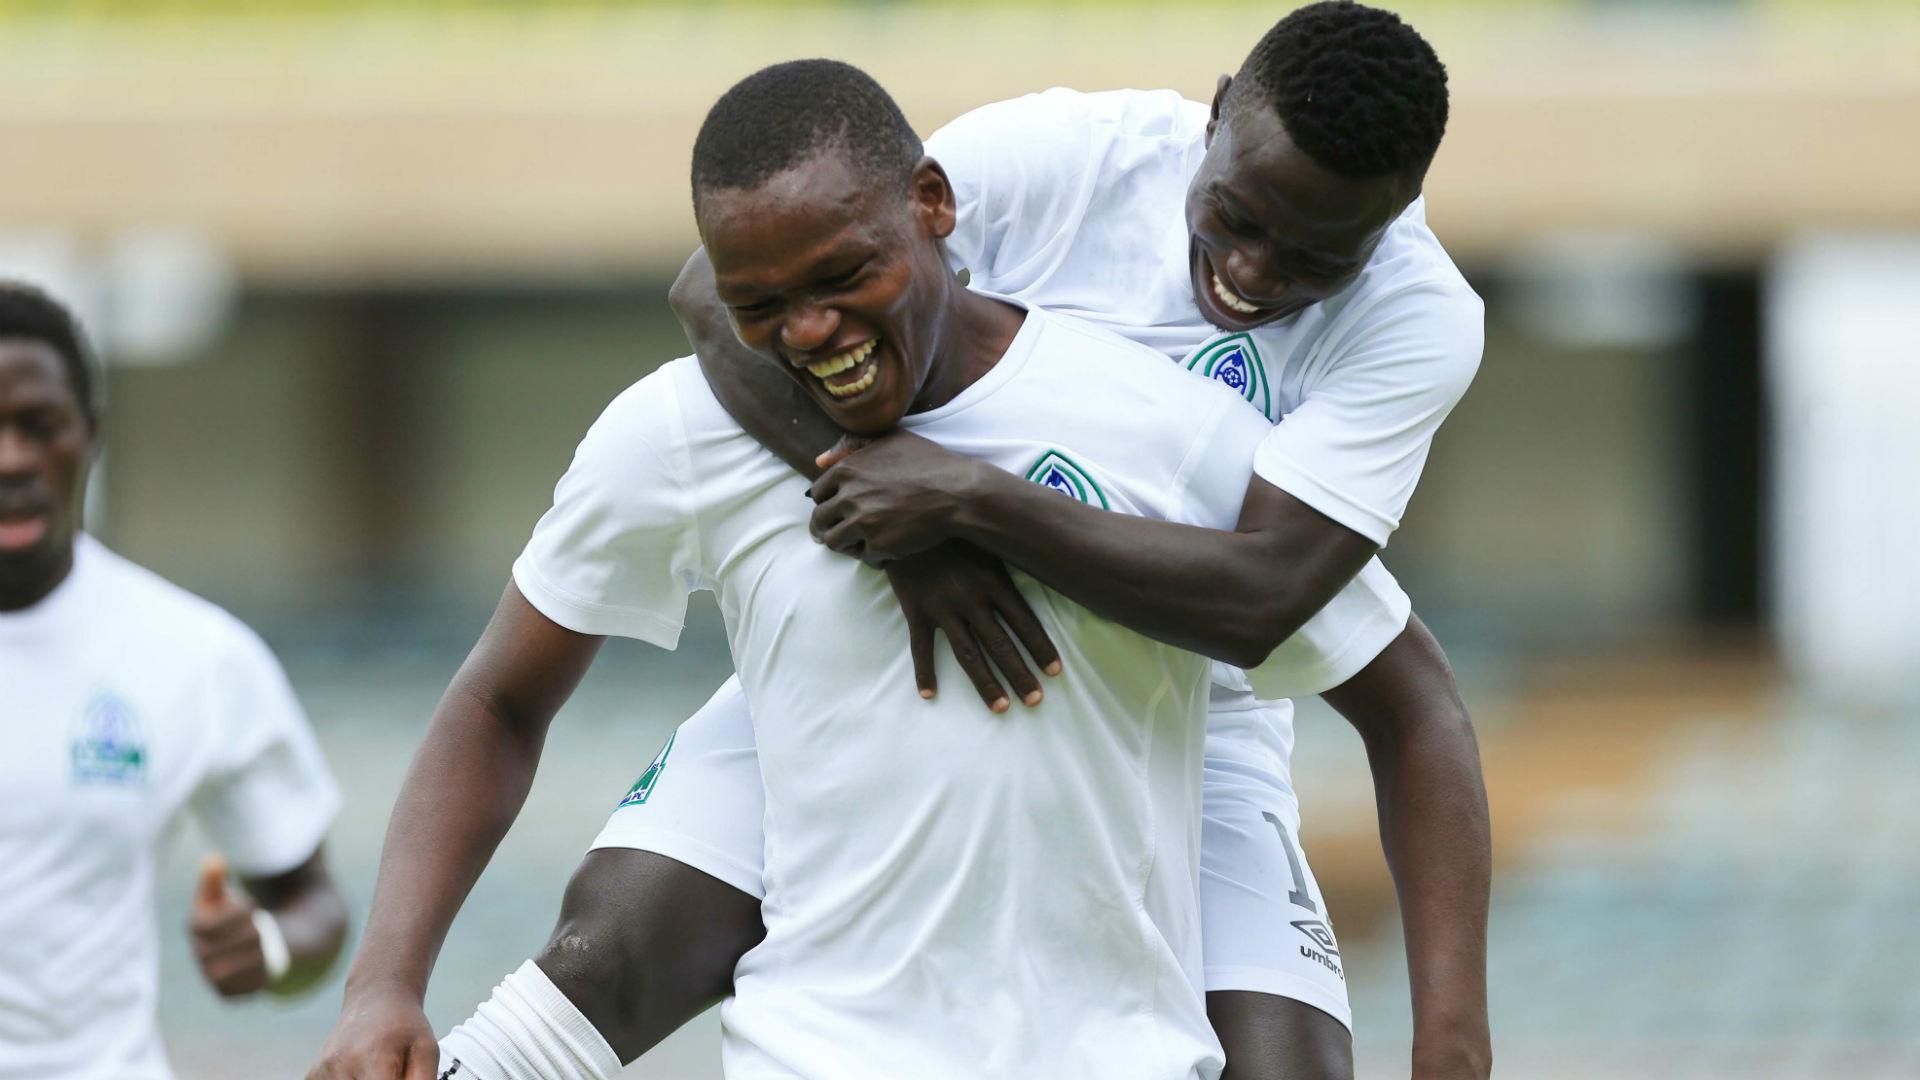 Kipkirui 'just saw the ball coming and went for it' - Gor Mahia striker reacts after scoring winner vs APR